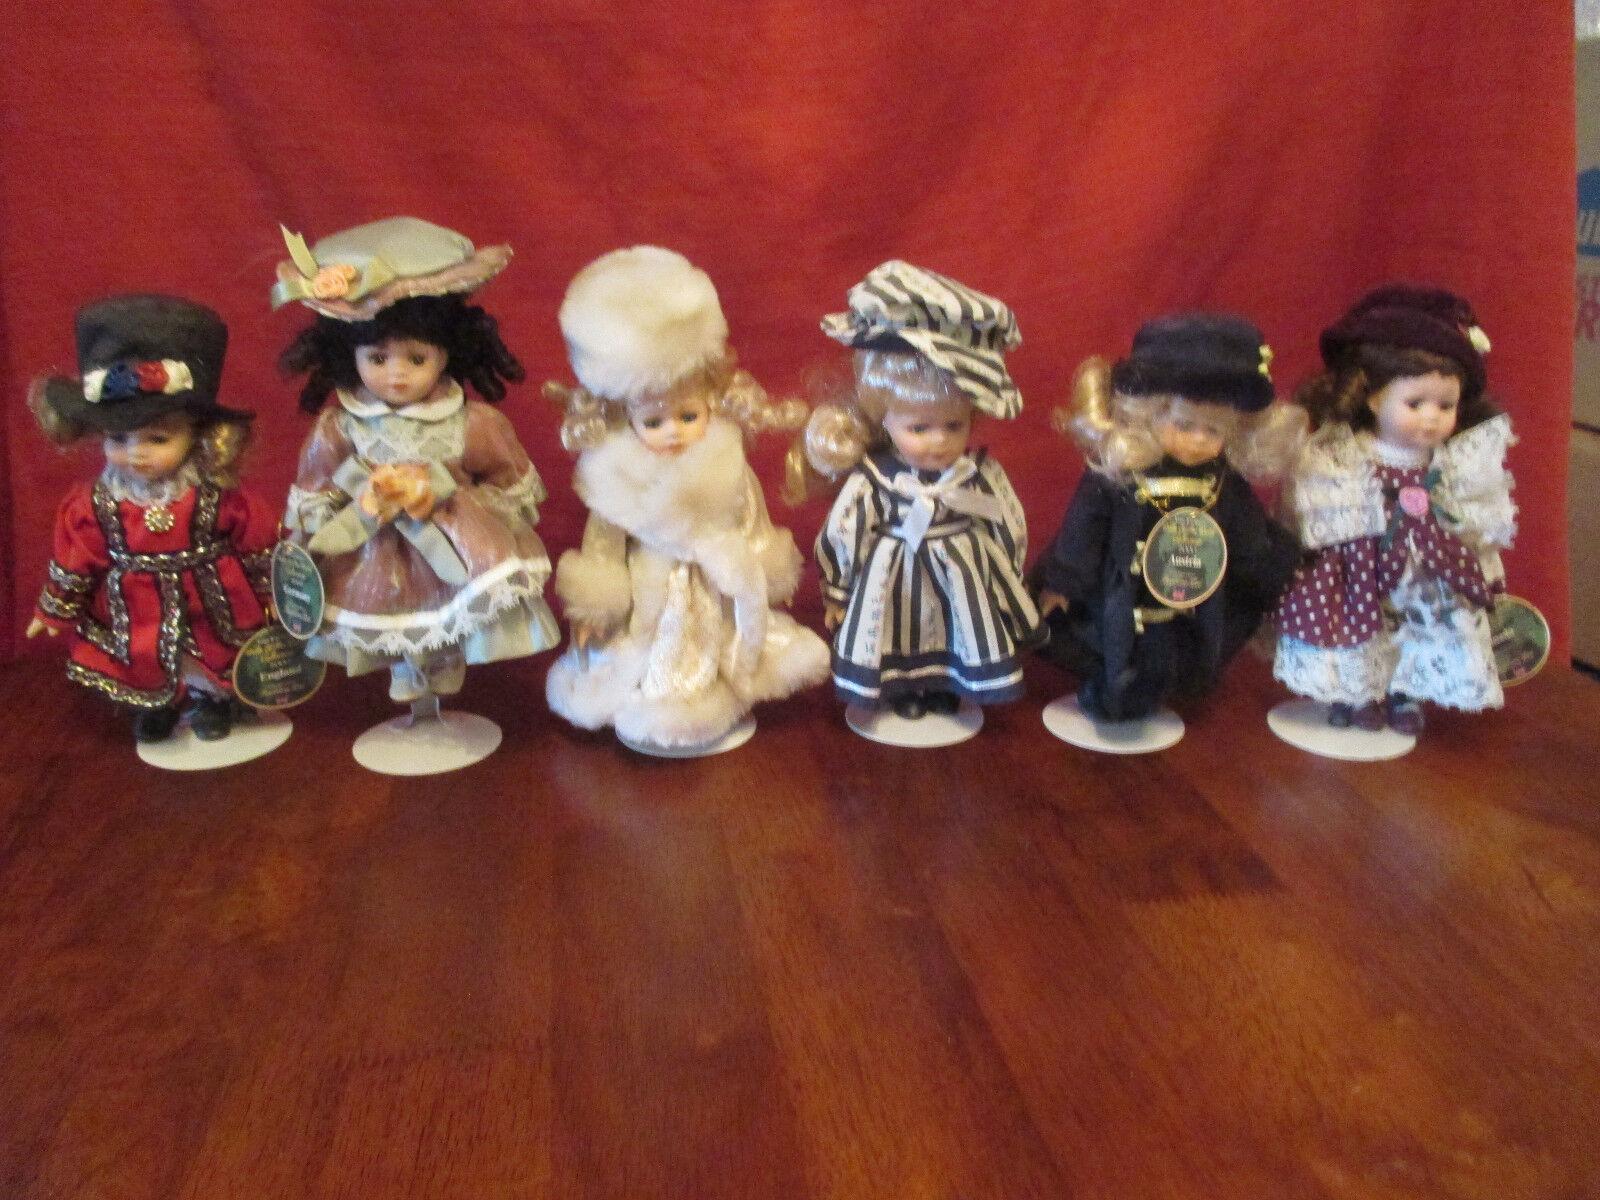 Set of 6 Barbara Lee 2000 Porcelain Dolls.. 1 missing tag..no box